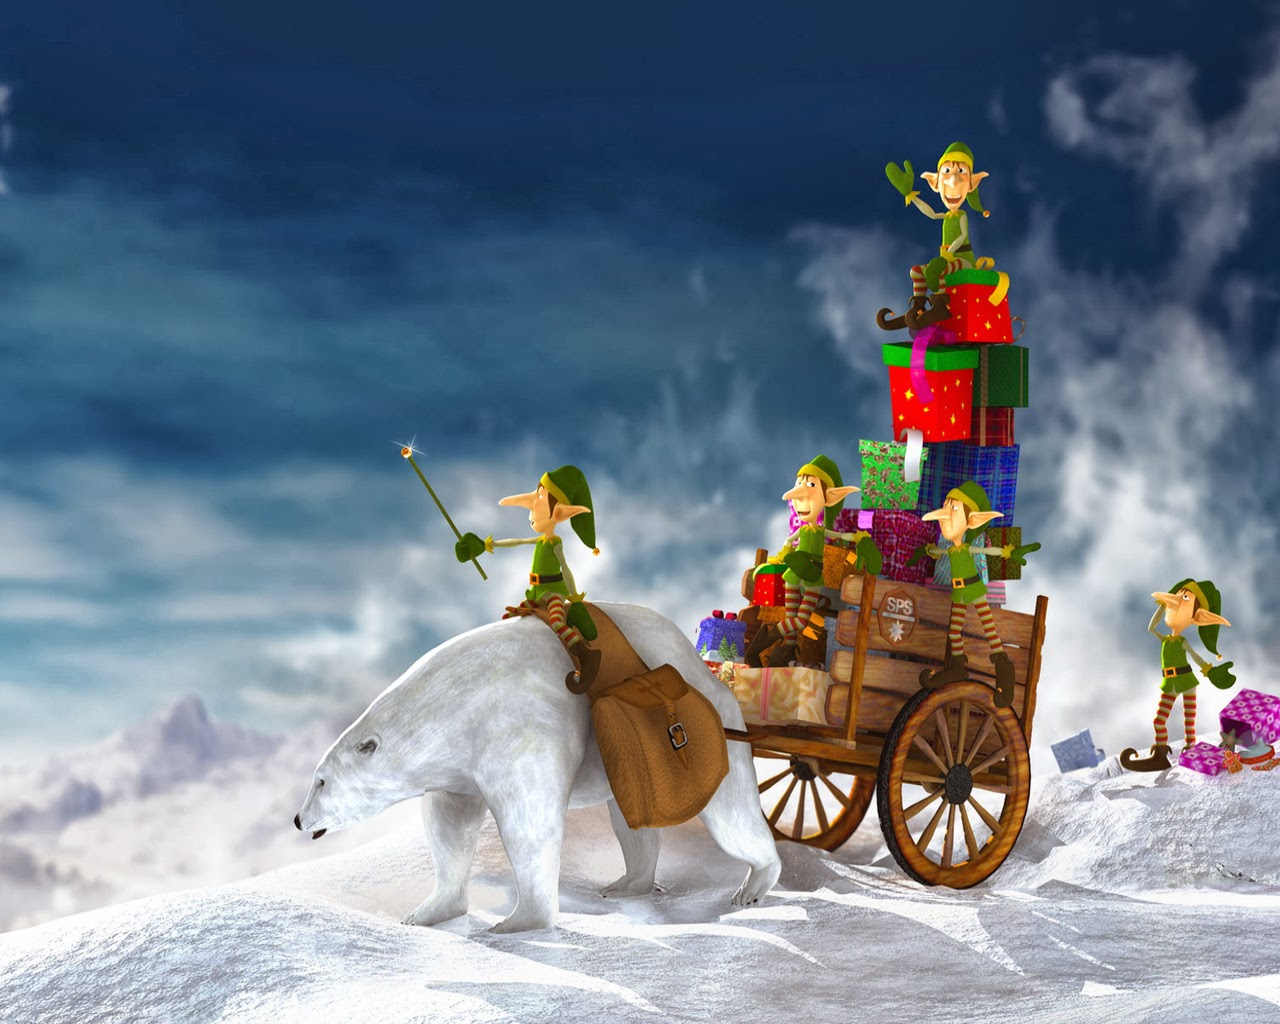 Christmas Wallpapers For Desktop 5jpg 1280x1024